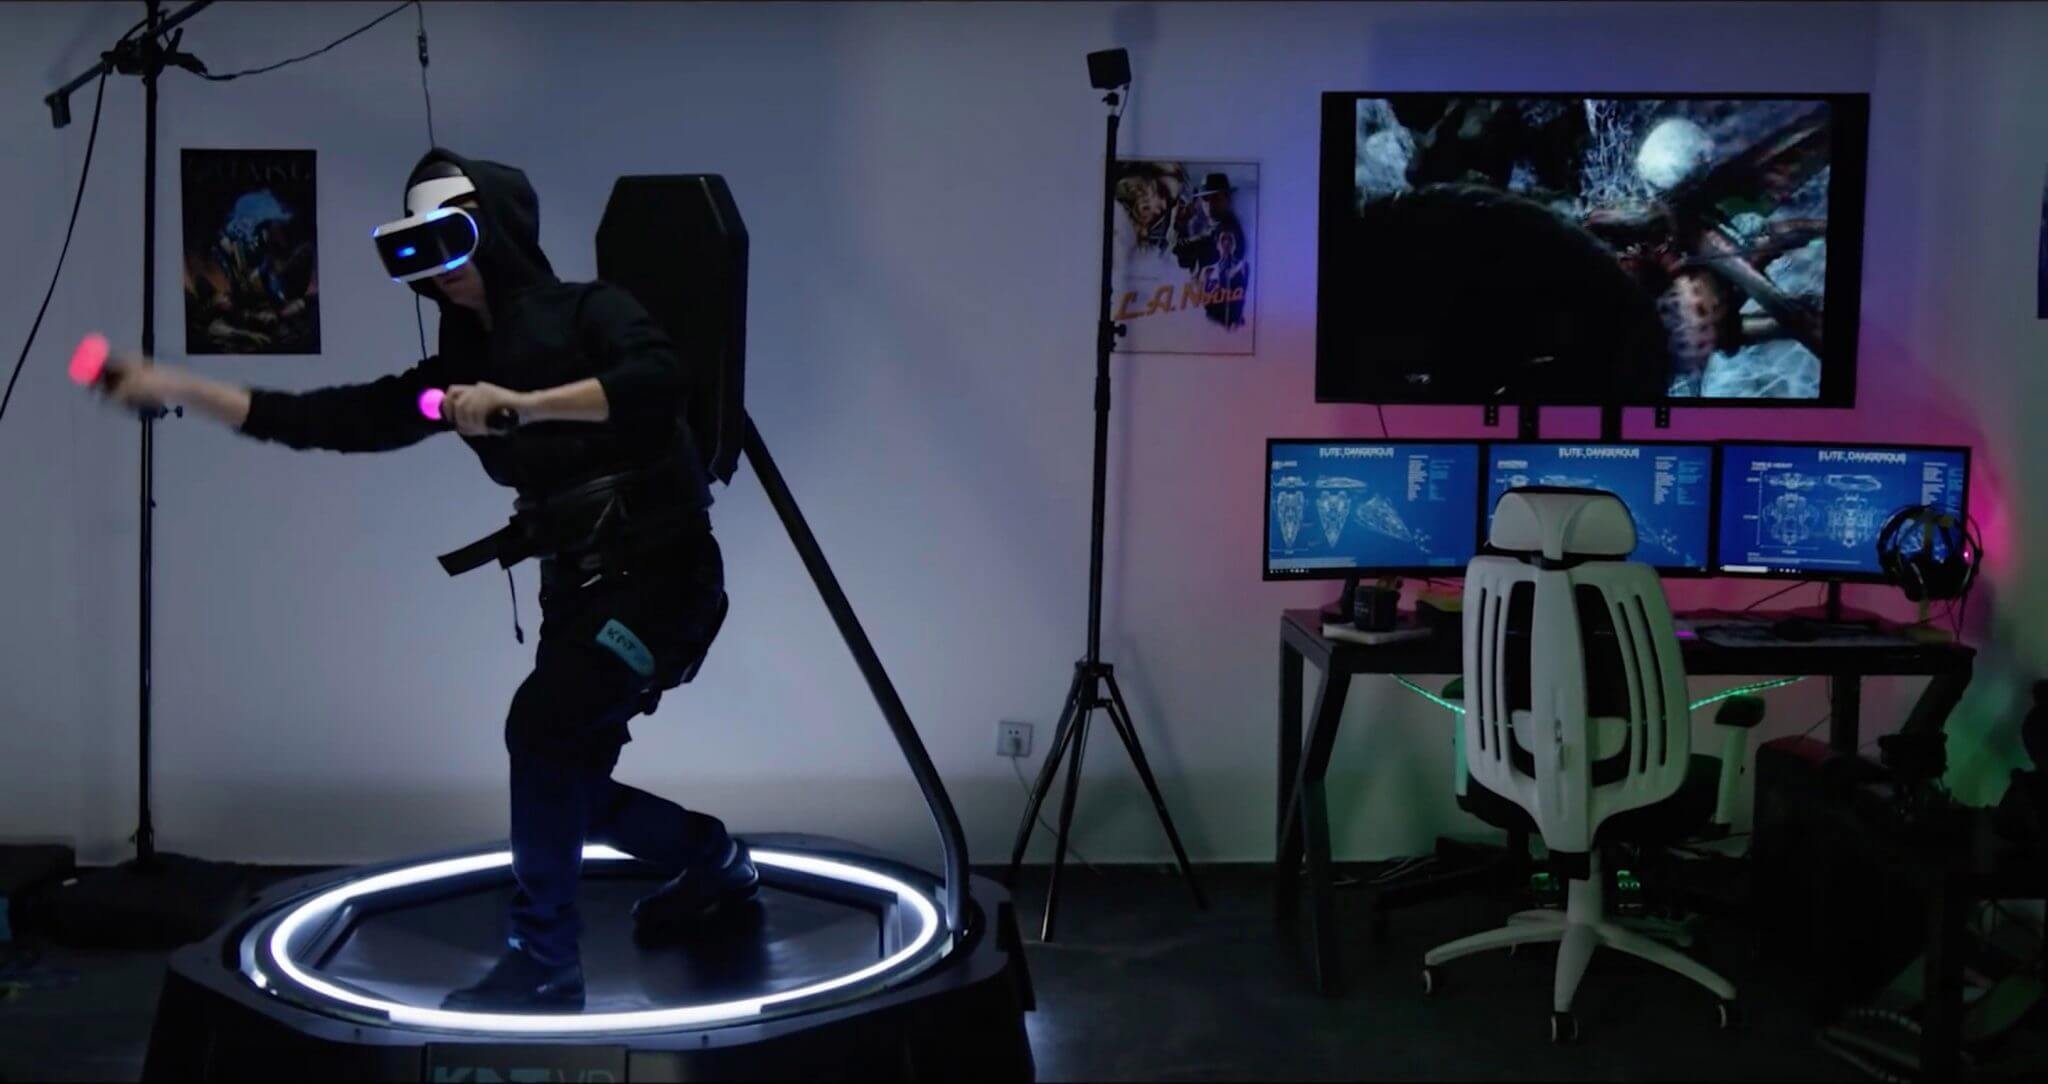 KAT Walk Mini: conheça a nova tecnologia de realidade virtual